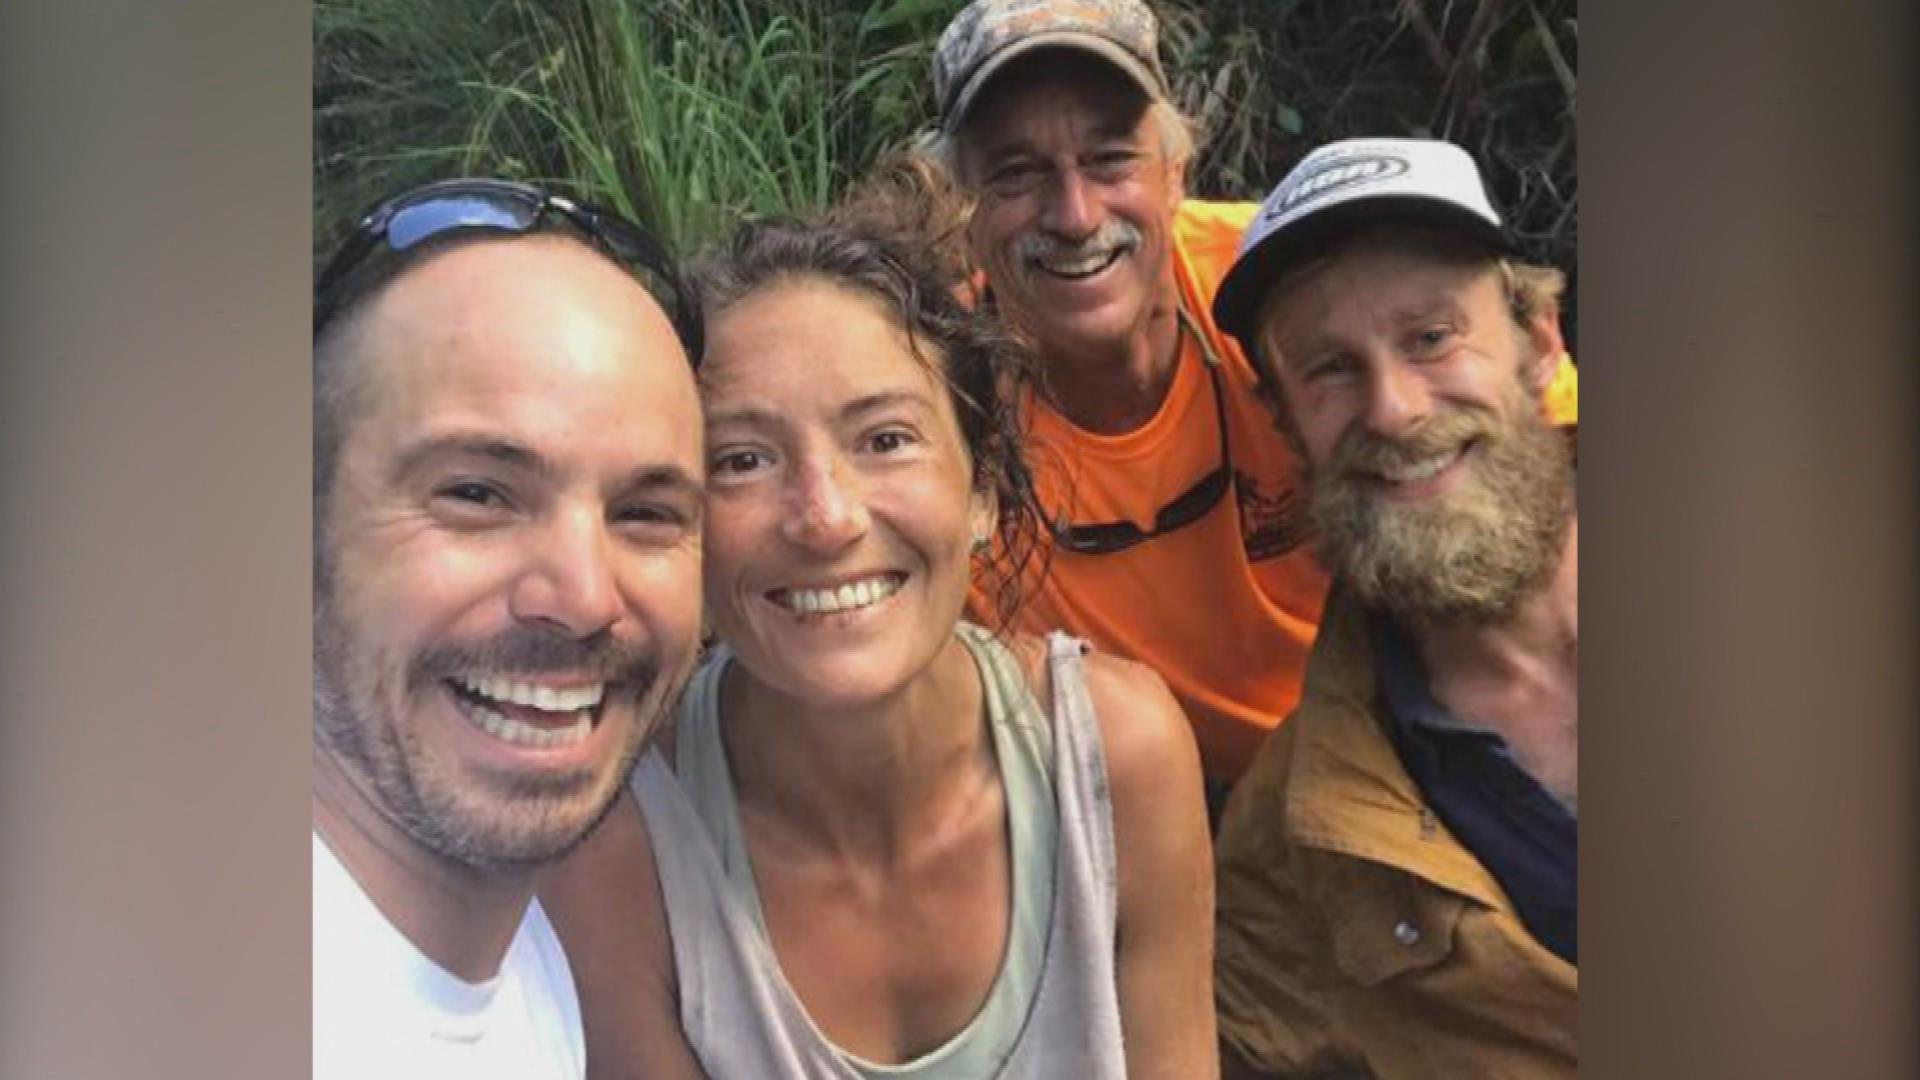 Missing Hawaii hiker found alive after 2 weeks